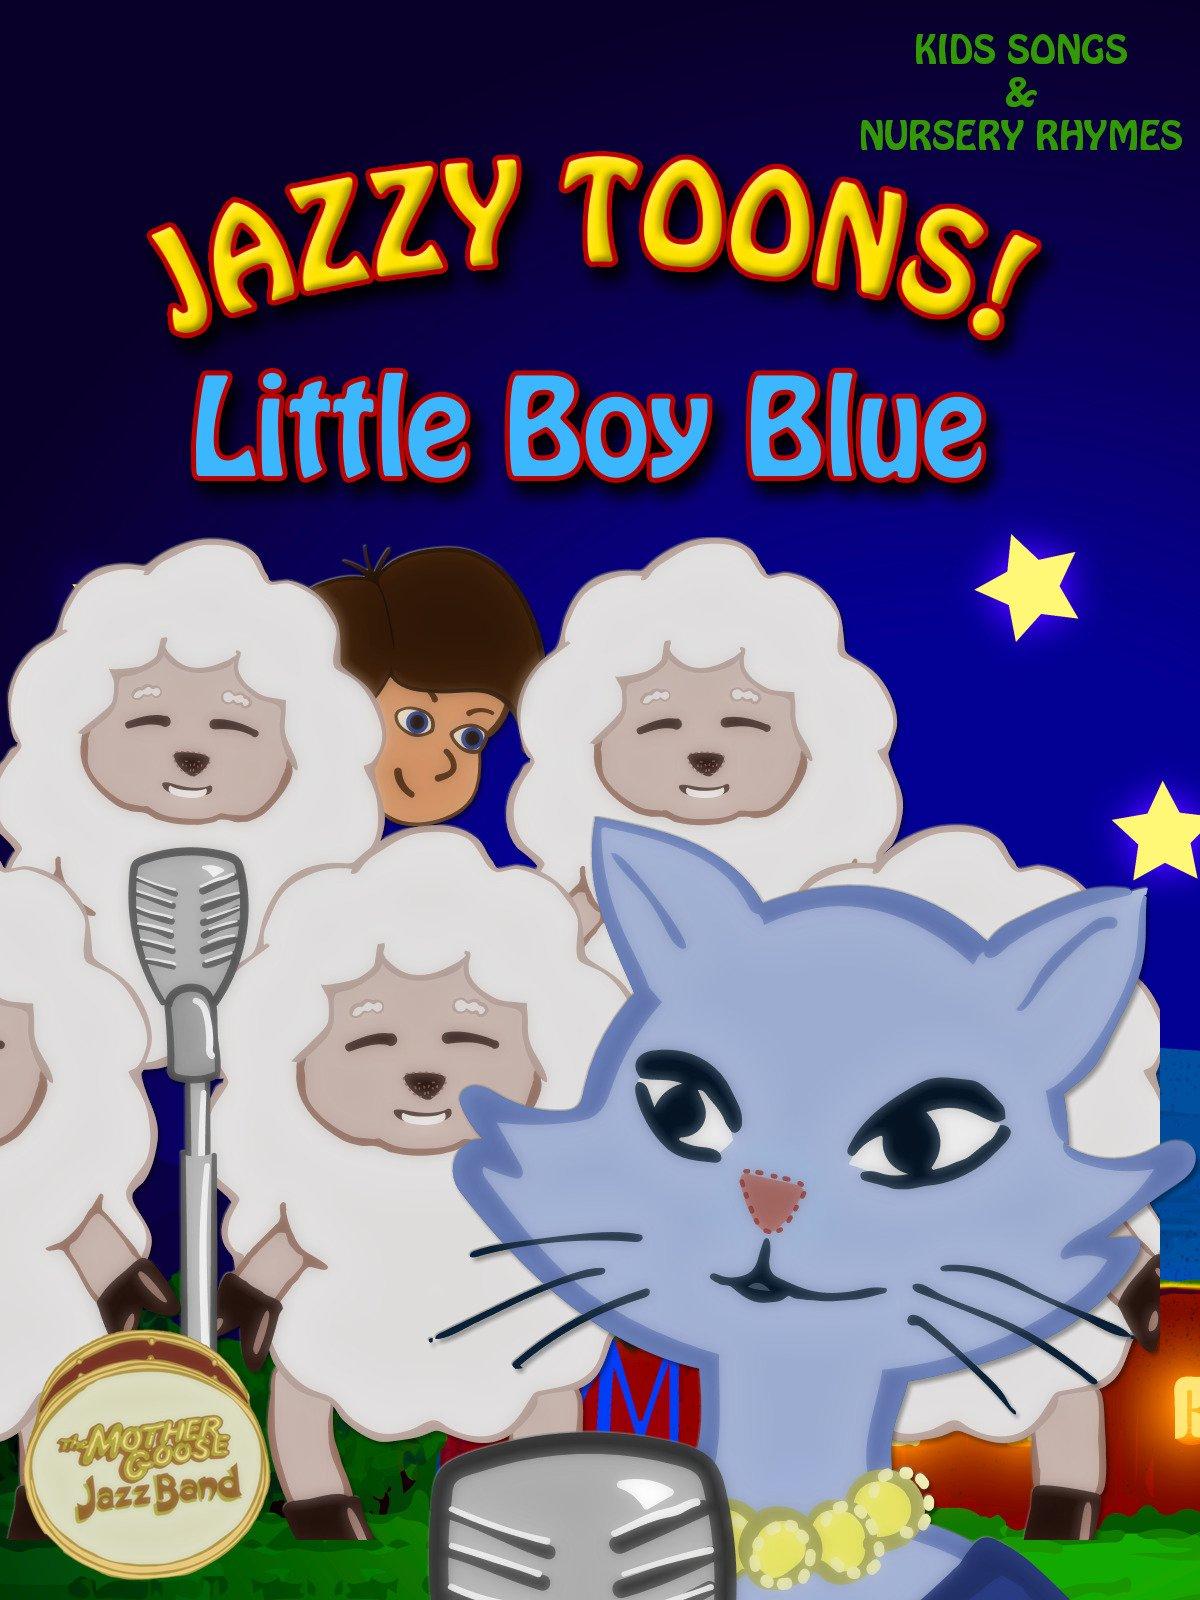 Jazzy Toons!